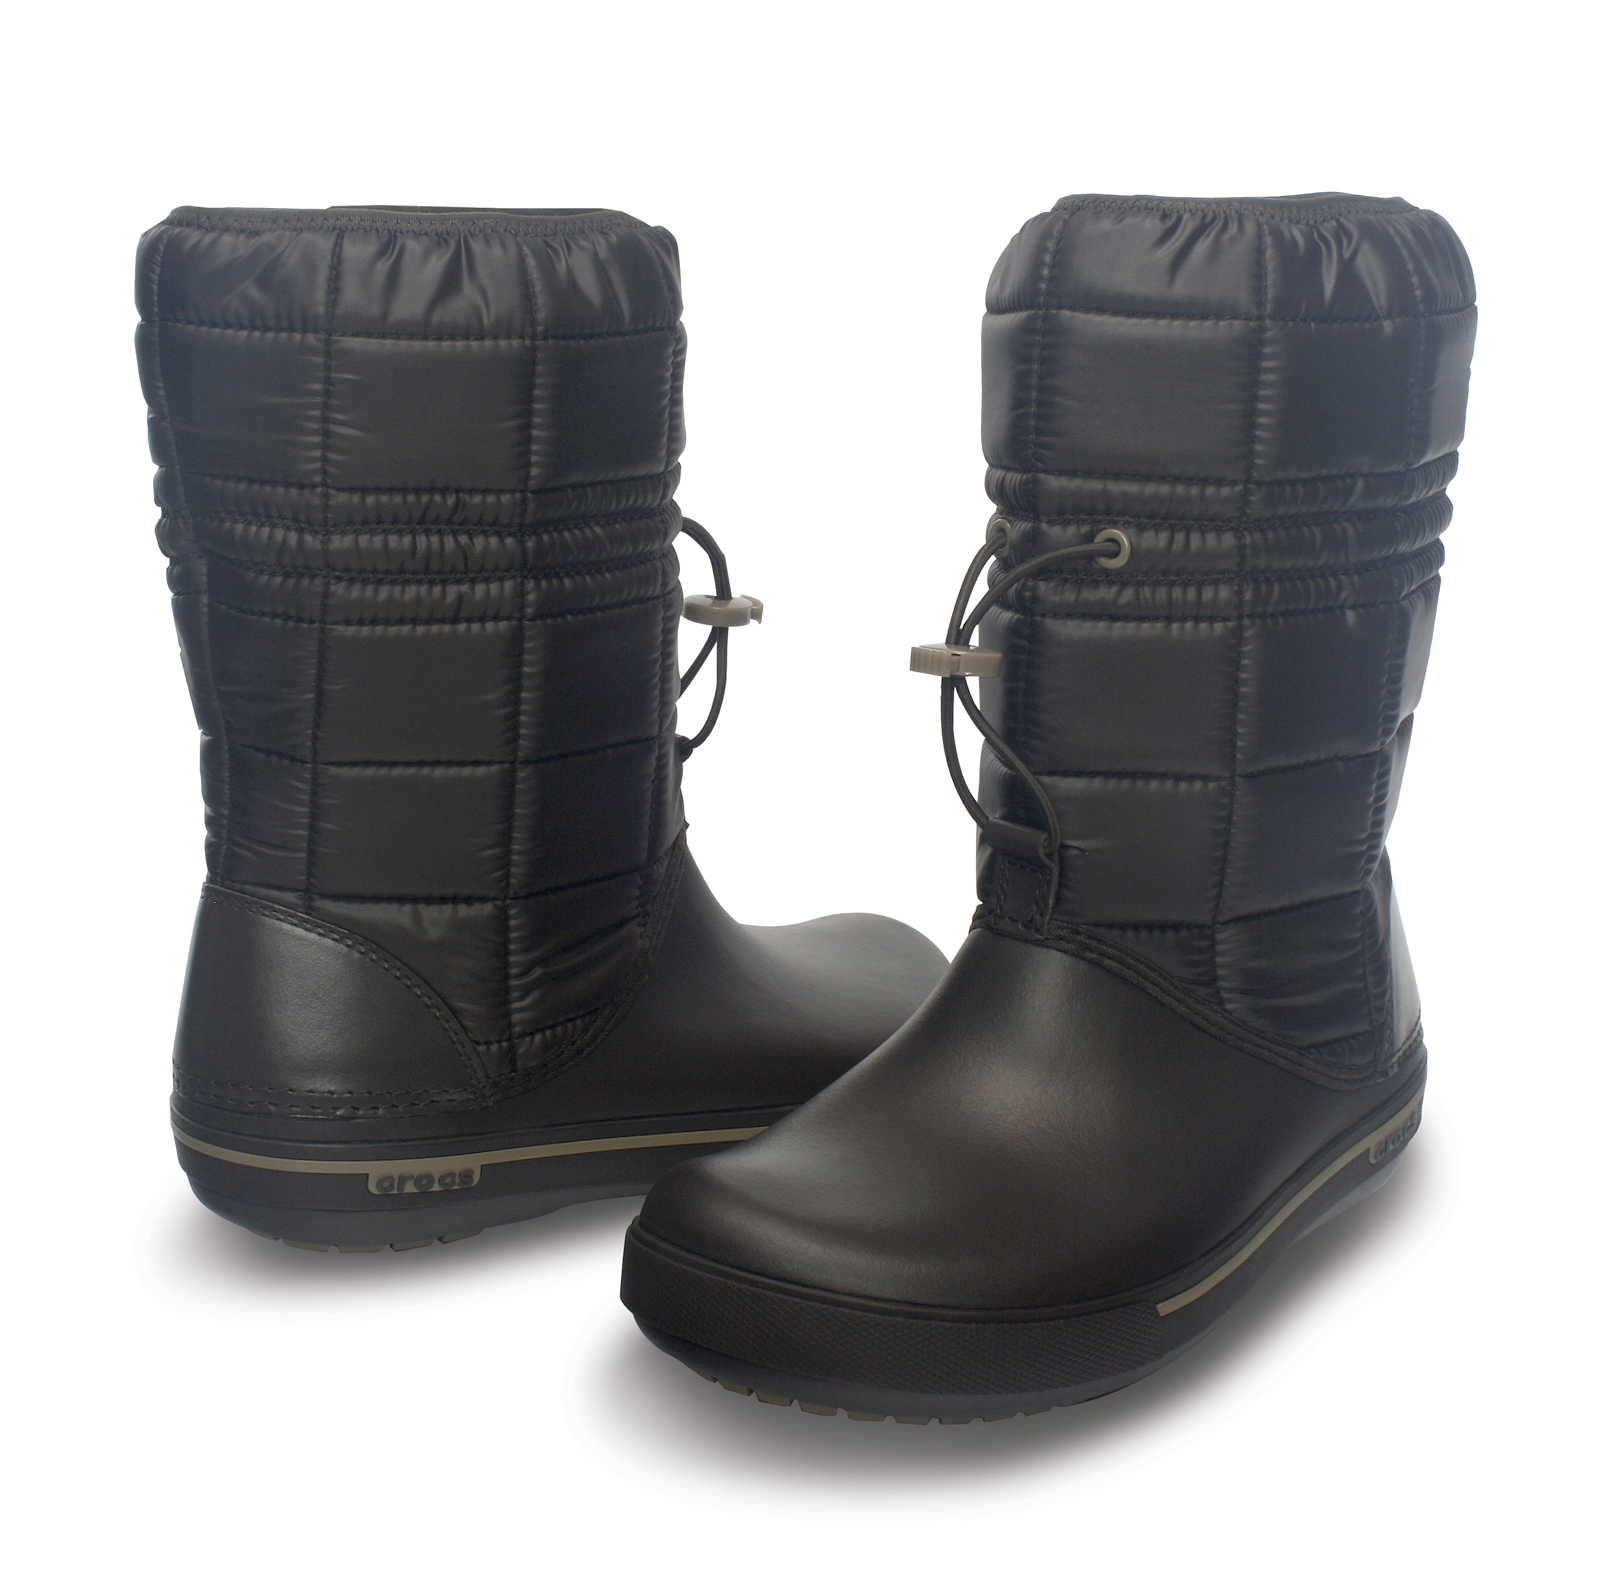 Womens Crocs Crocband Ii5 Warm Lined Winter Snow Soft